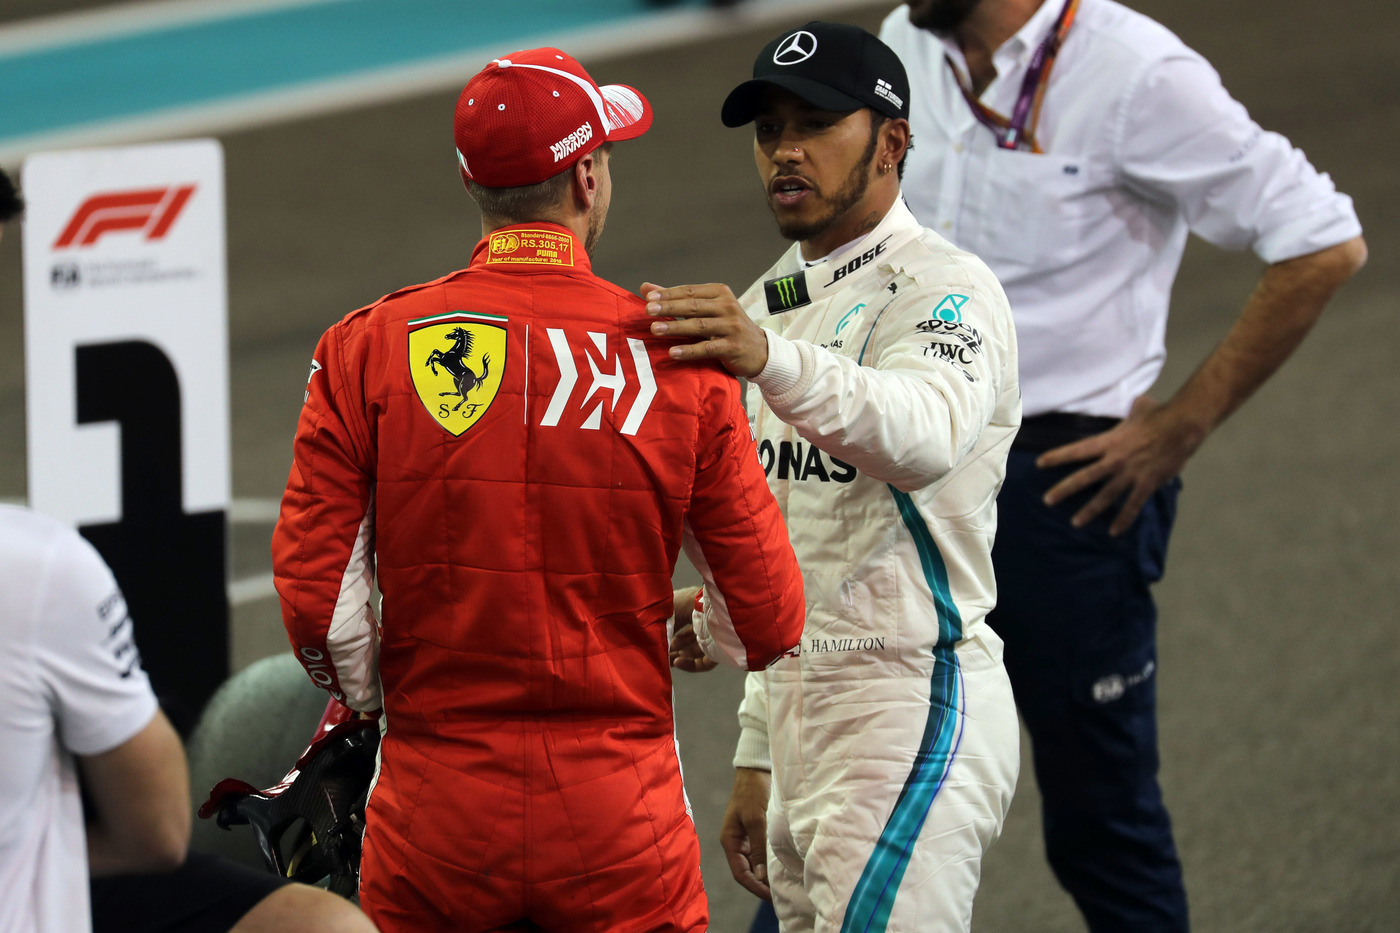 F1, Sebastian Vettel torna sull'incidente di Hockenheim: